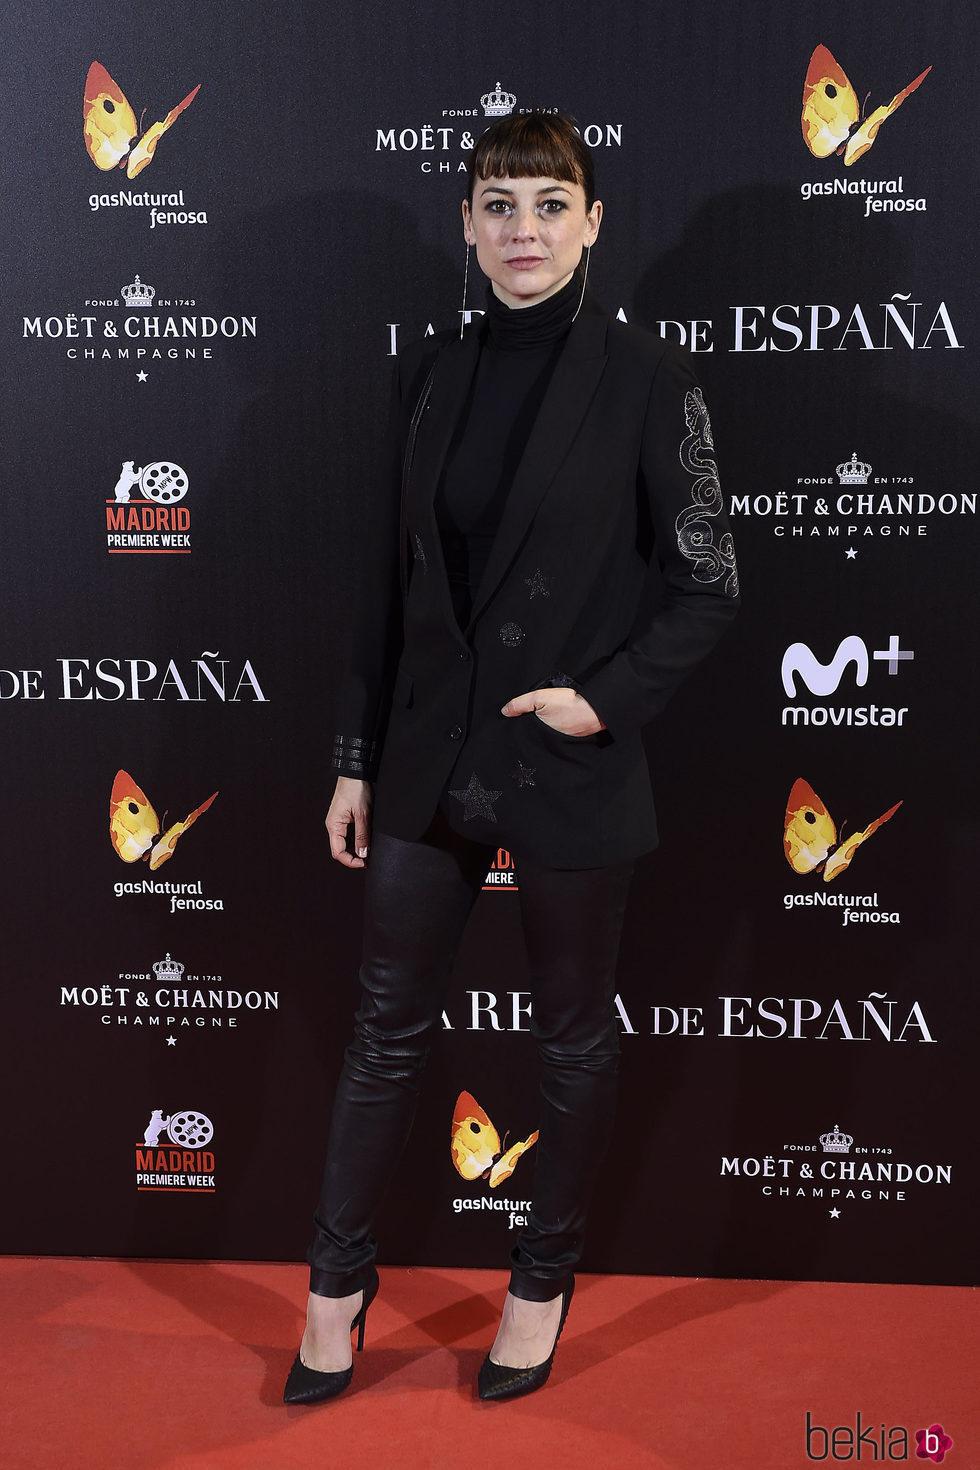 Leonor Watling en la premiere de 'La Reina de España' en Madrid